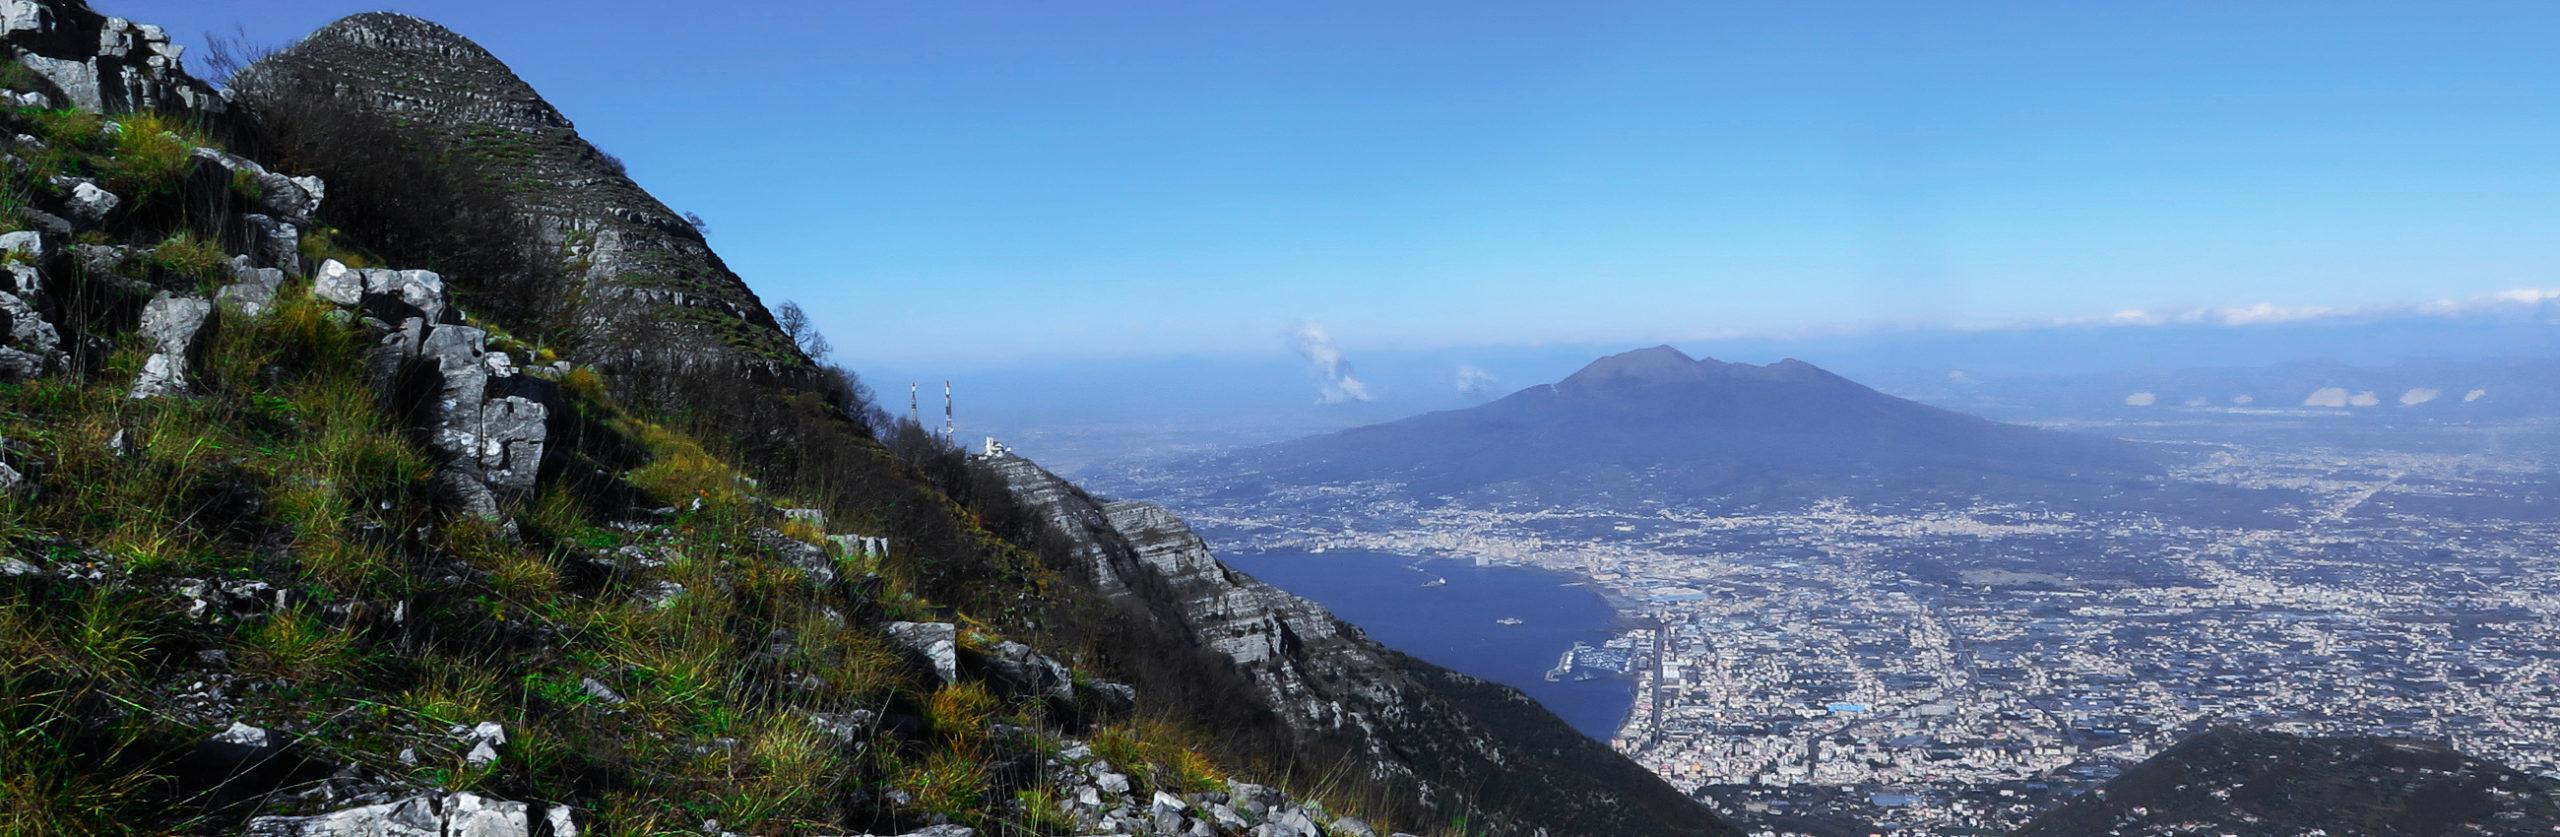 Trekking sull'Alta Via tra Amalfi e Sorrento